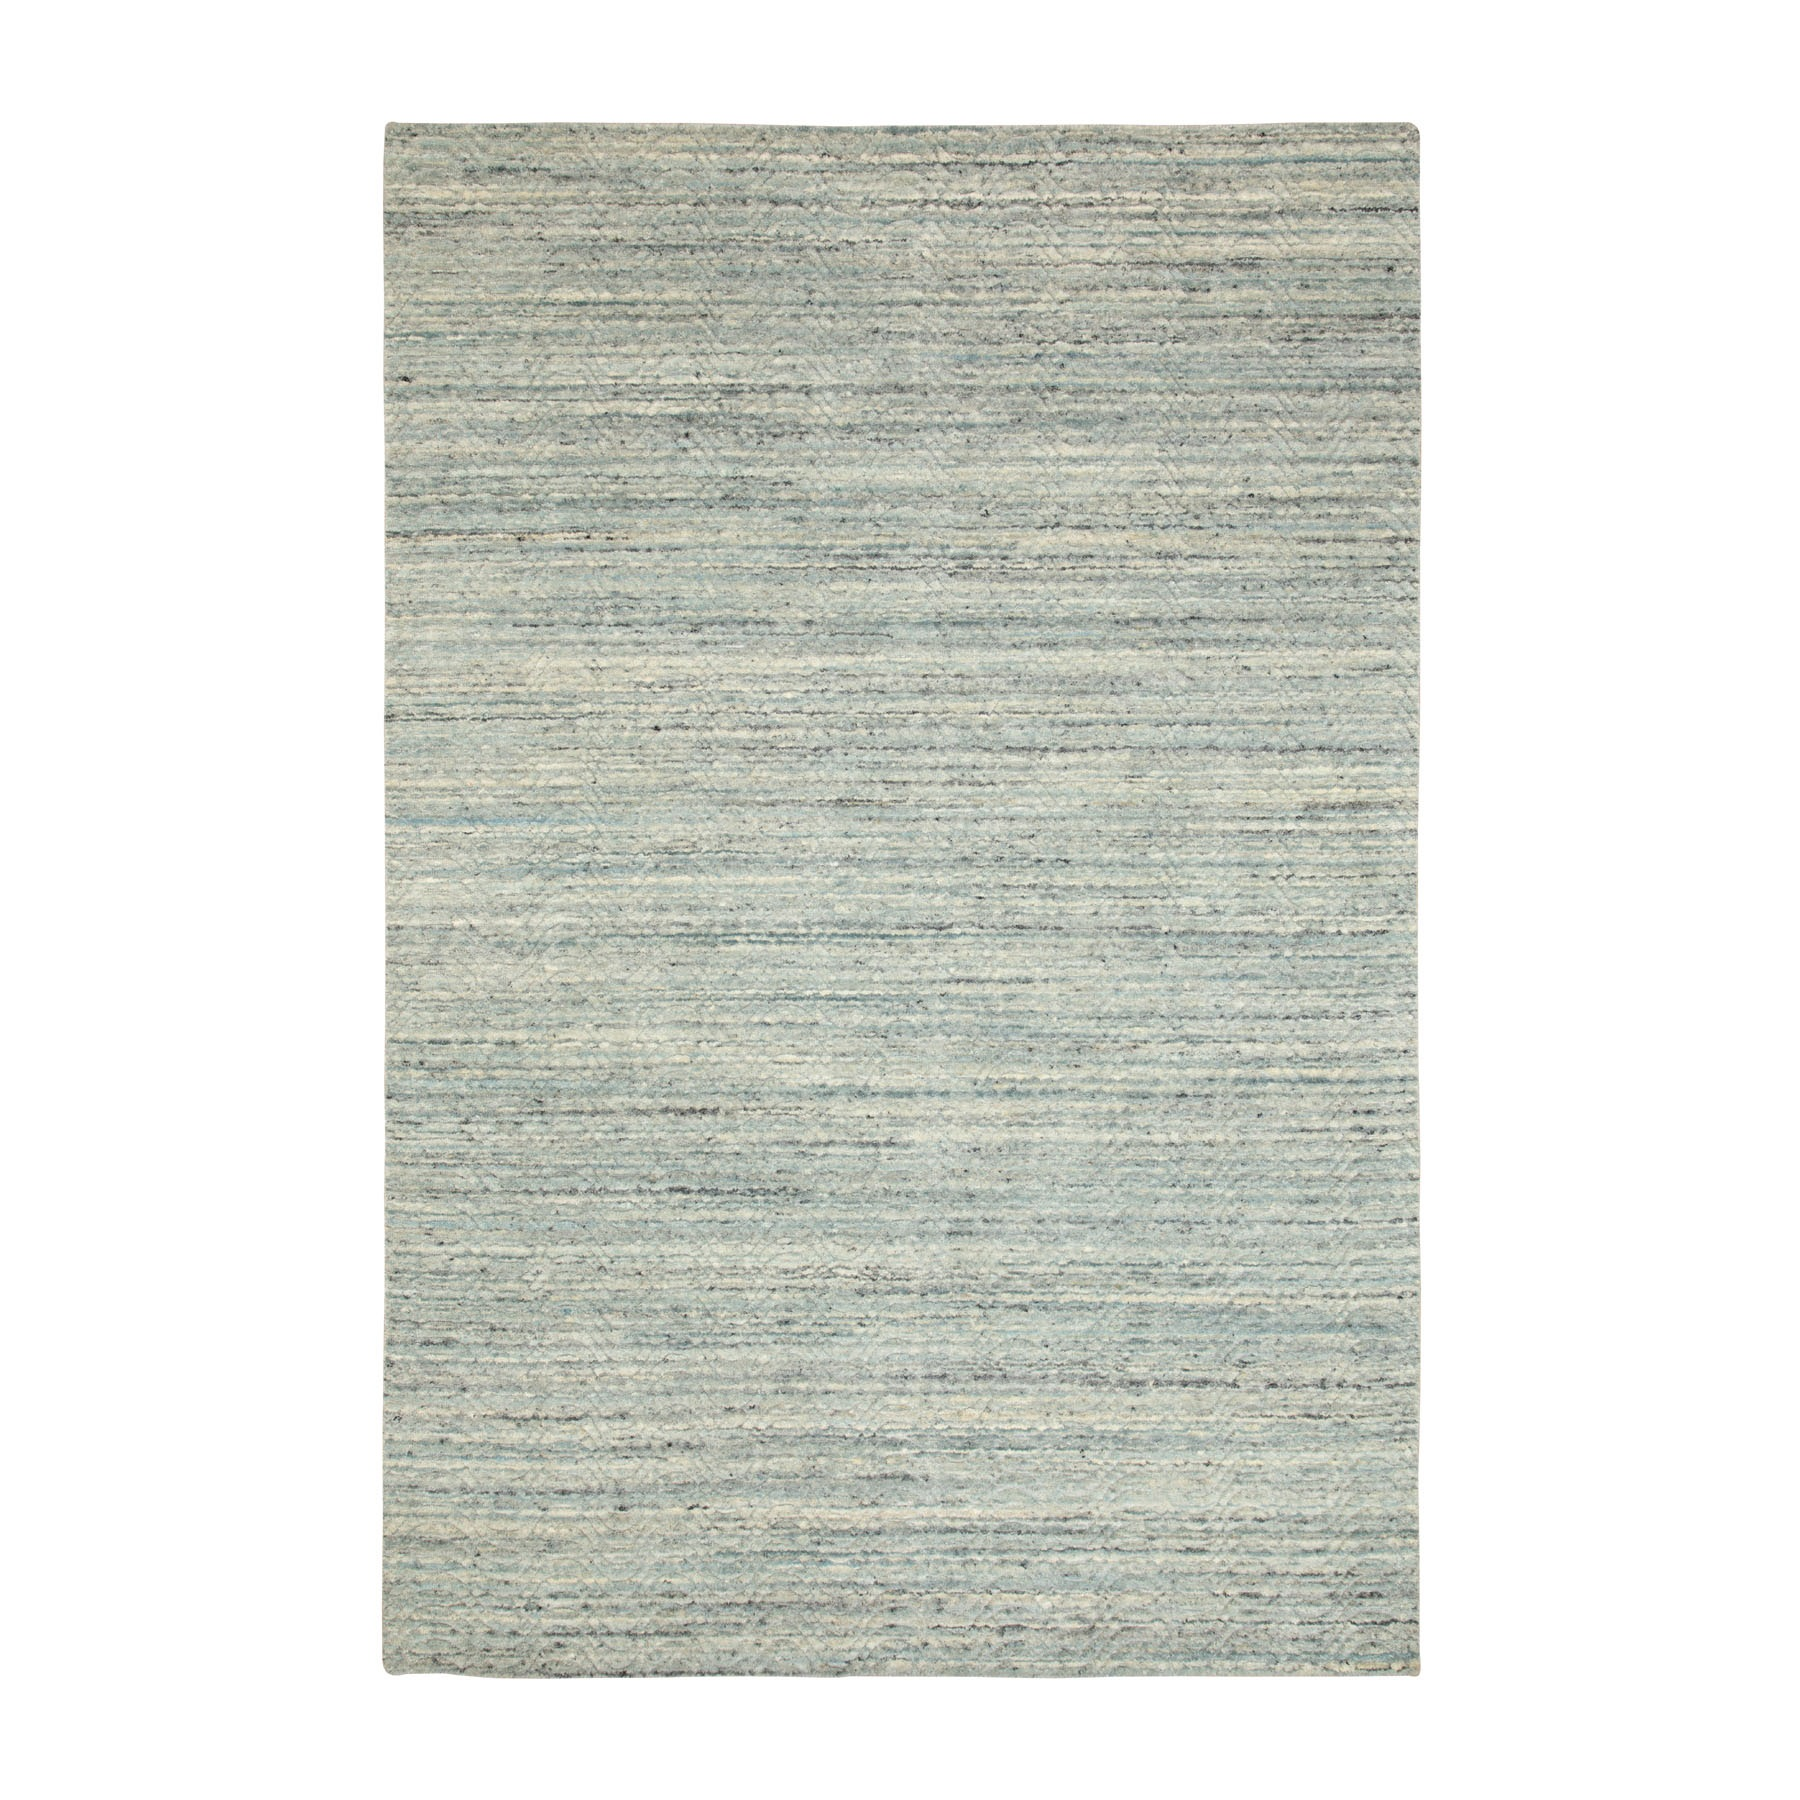 6'x9' Green Variegated Design Hand Loomed Pure Wool Modern Oriental Rug